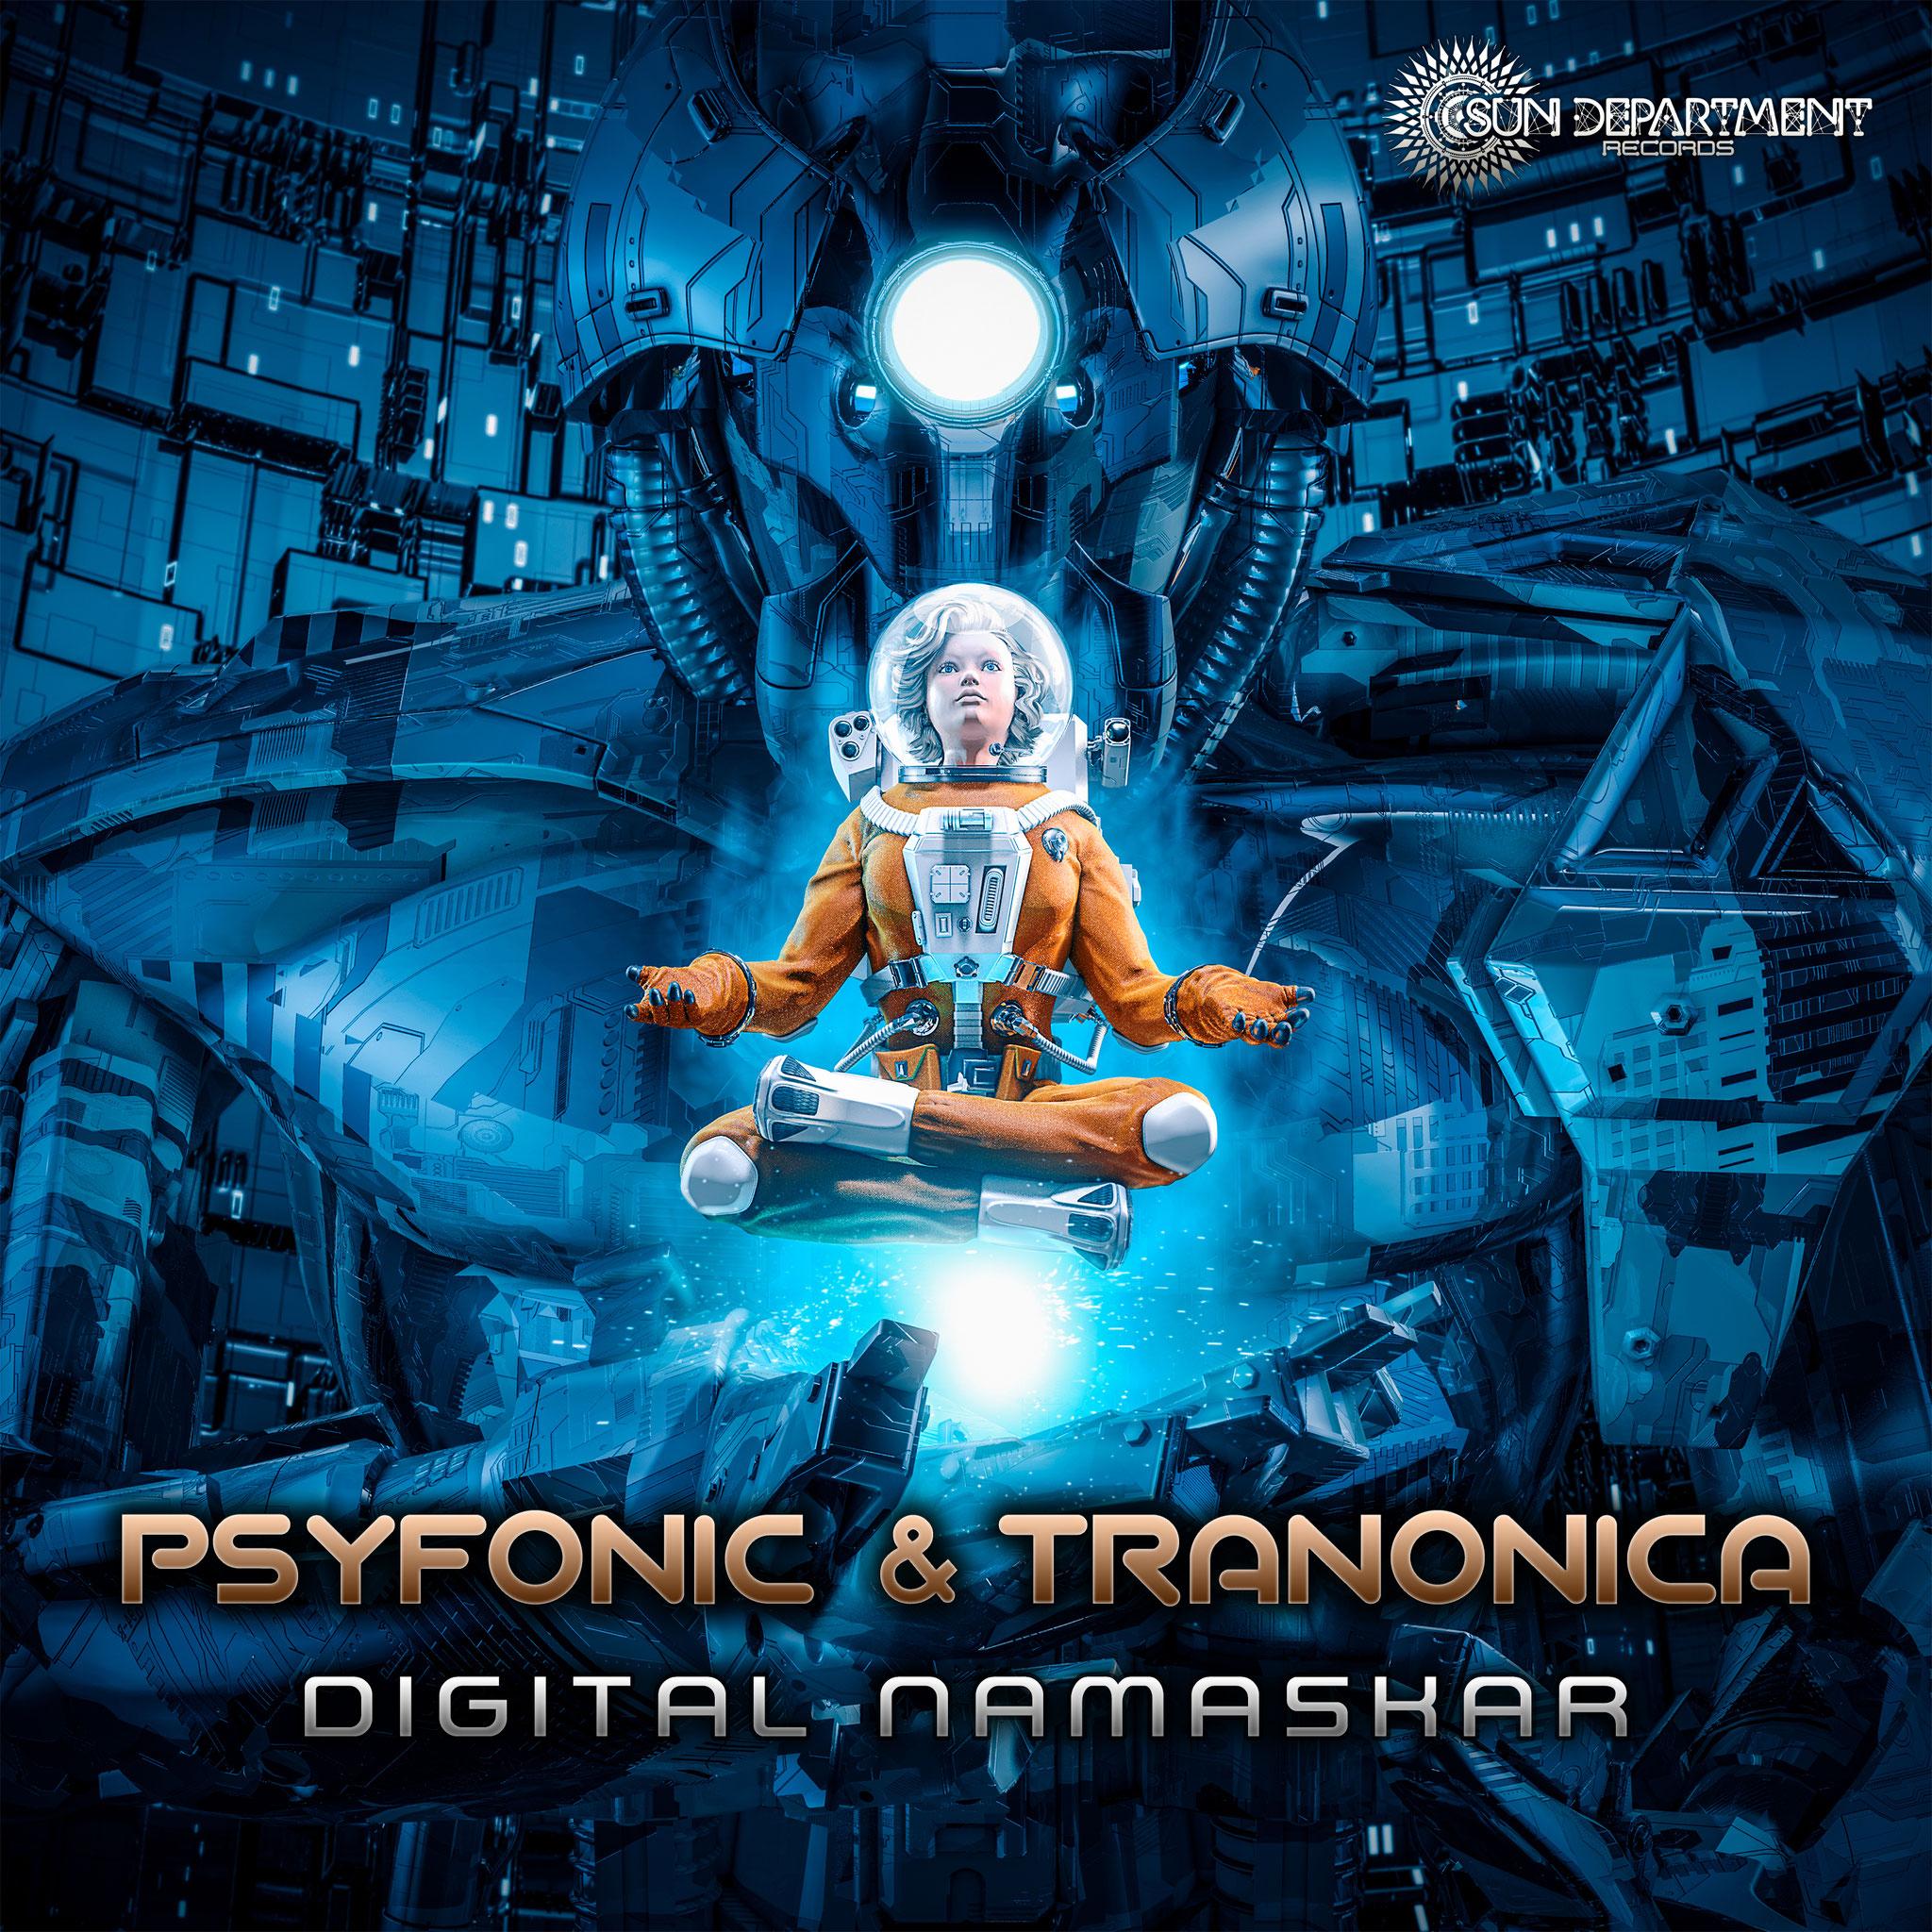 Psyfonic & Tranonica - Digital Namaskar